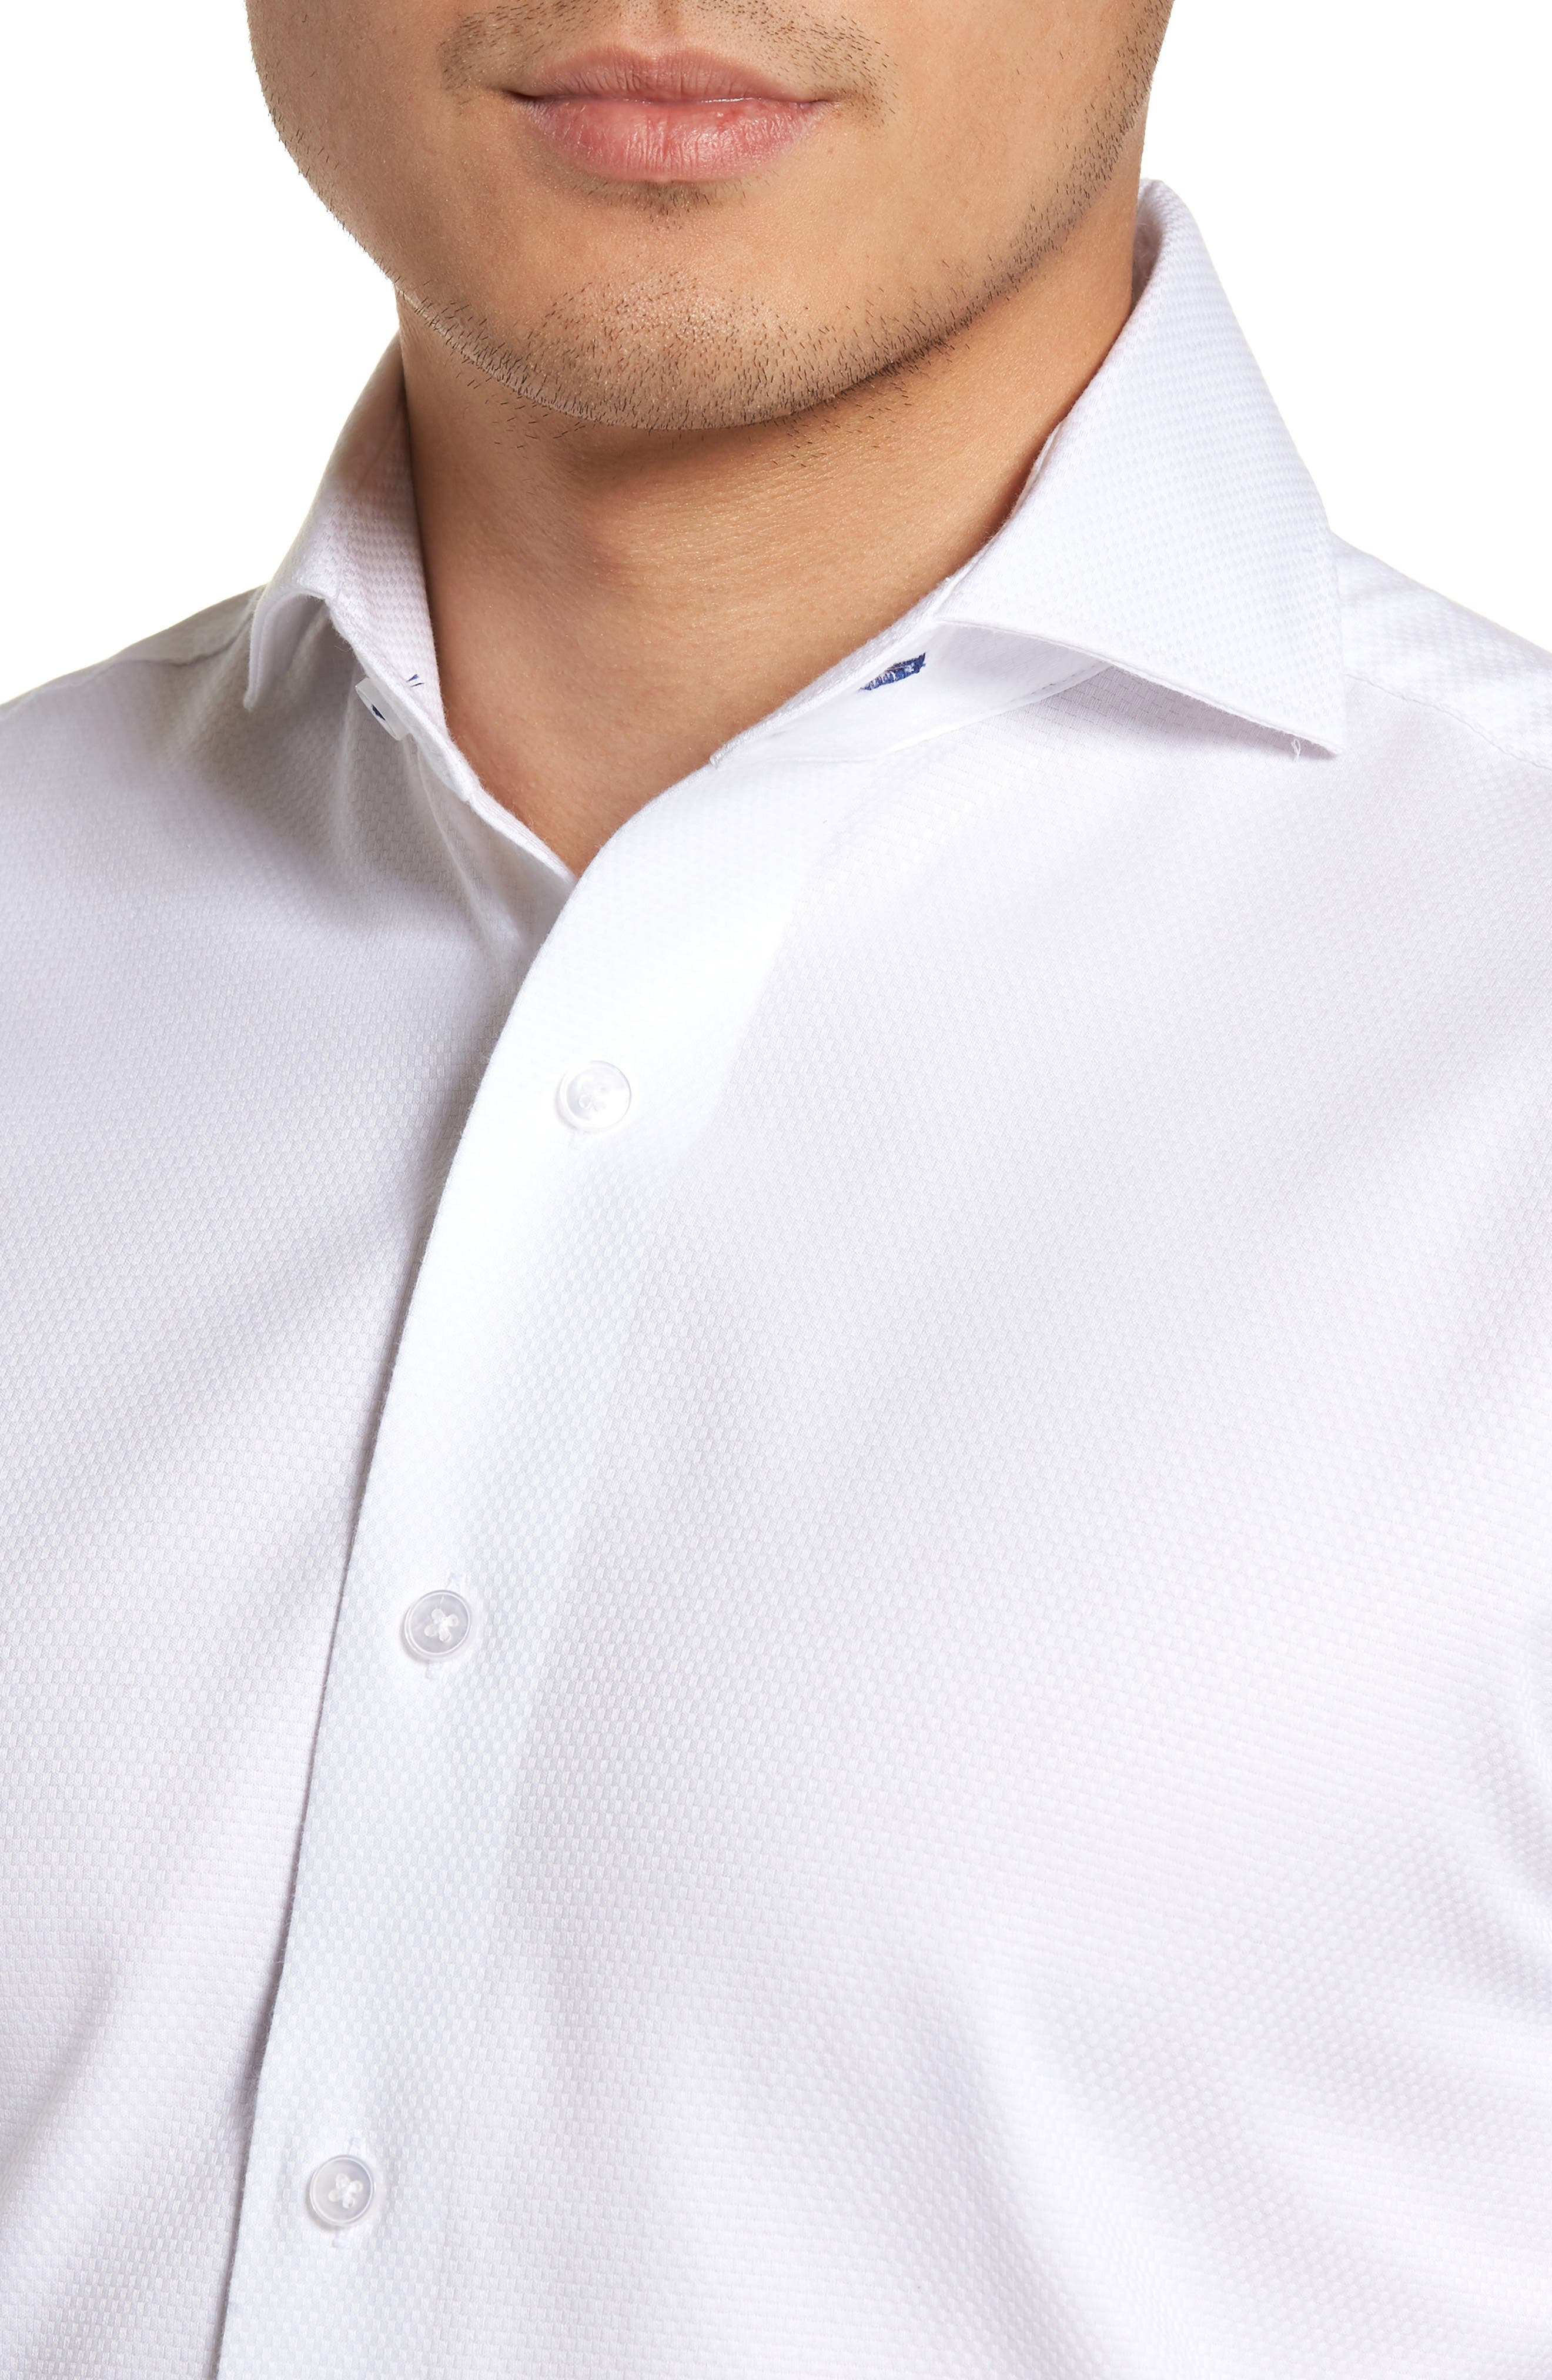 LORENZO UOMO, Trim Fit Basket Weave Dress Shirt, Alternate thumbnail 2, color, WHITE